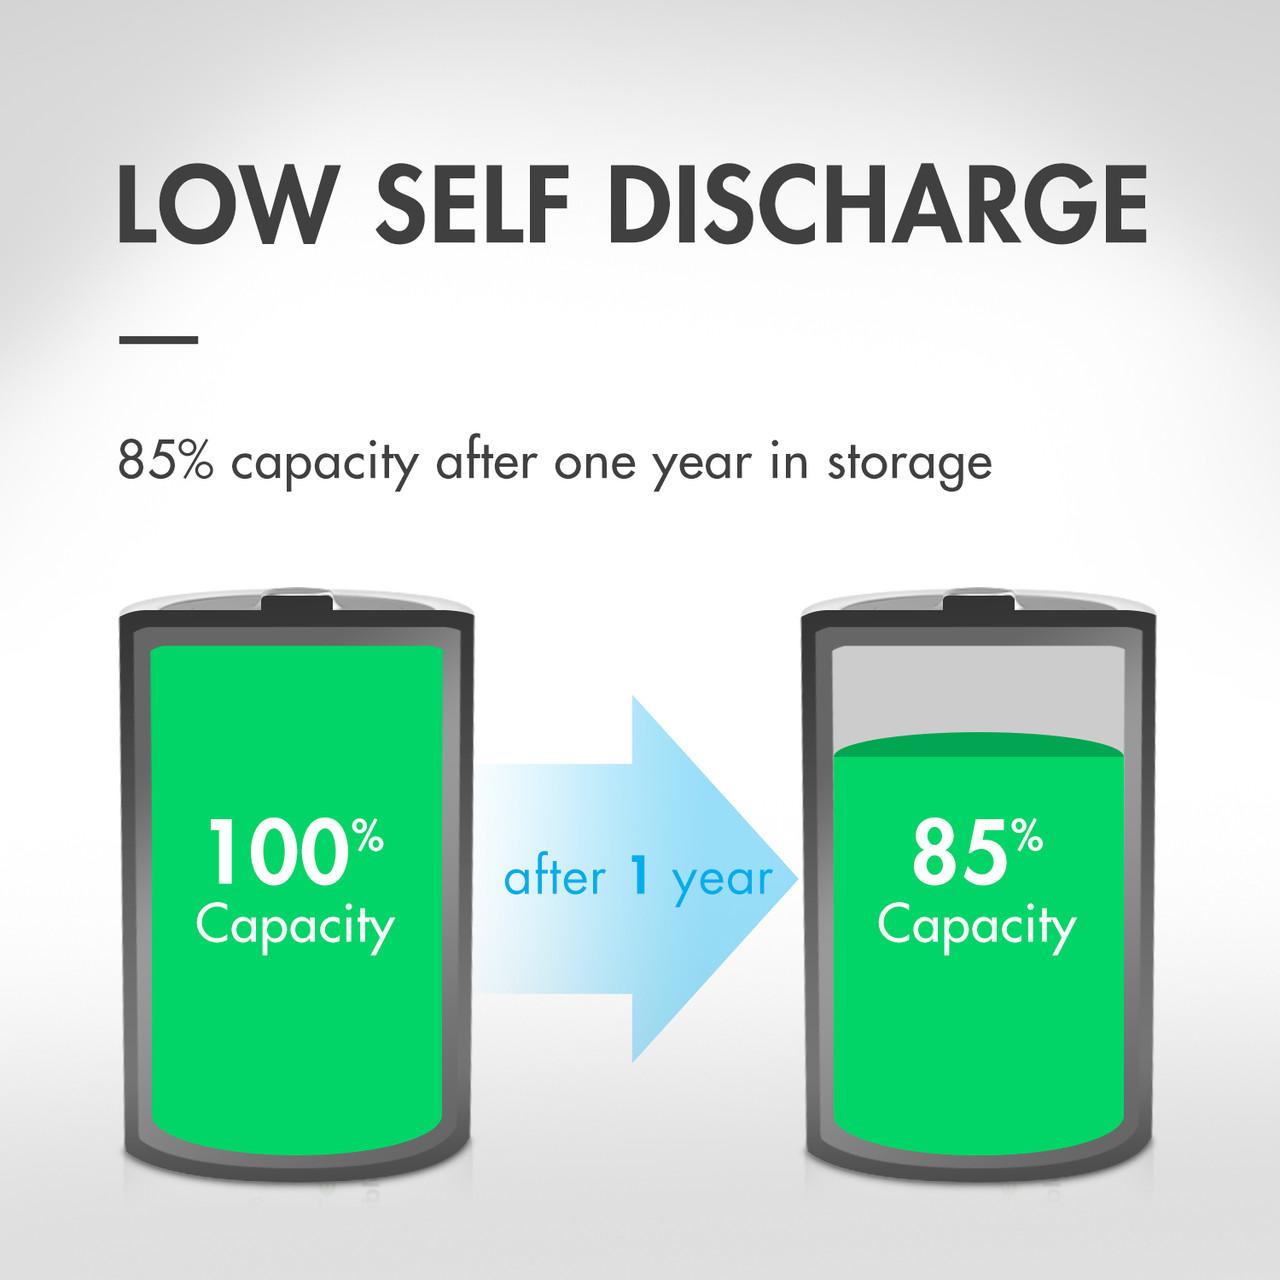 16pcs Tenergy Centura NiMH D 1.2V 8000mAh Rechargeable Battery